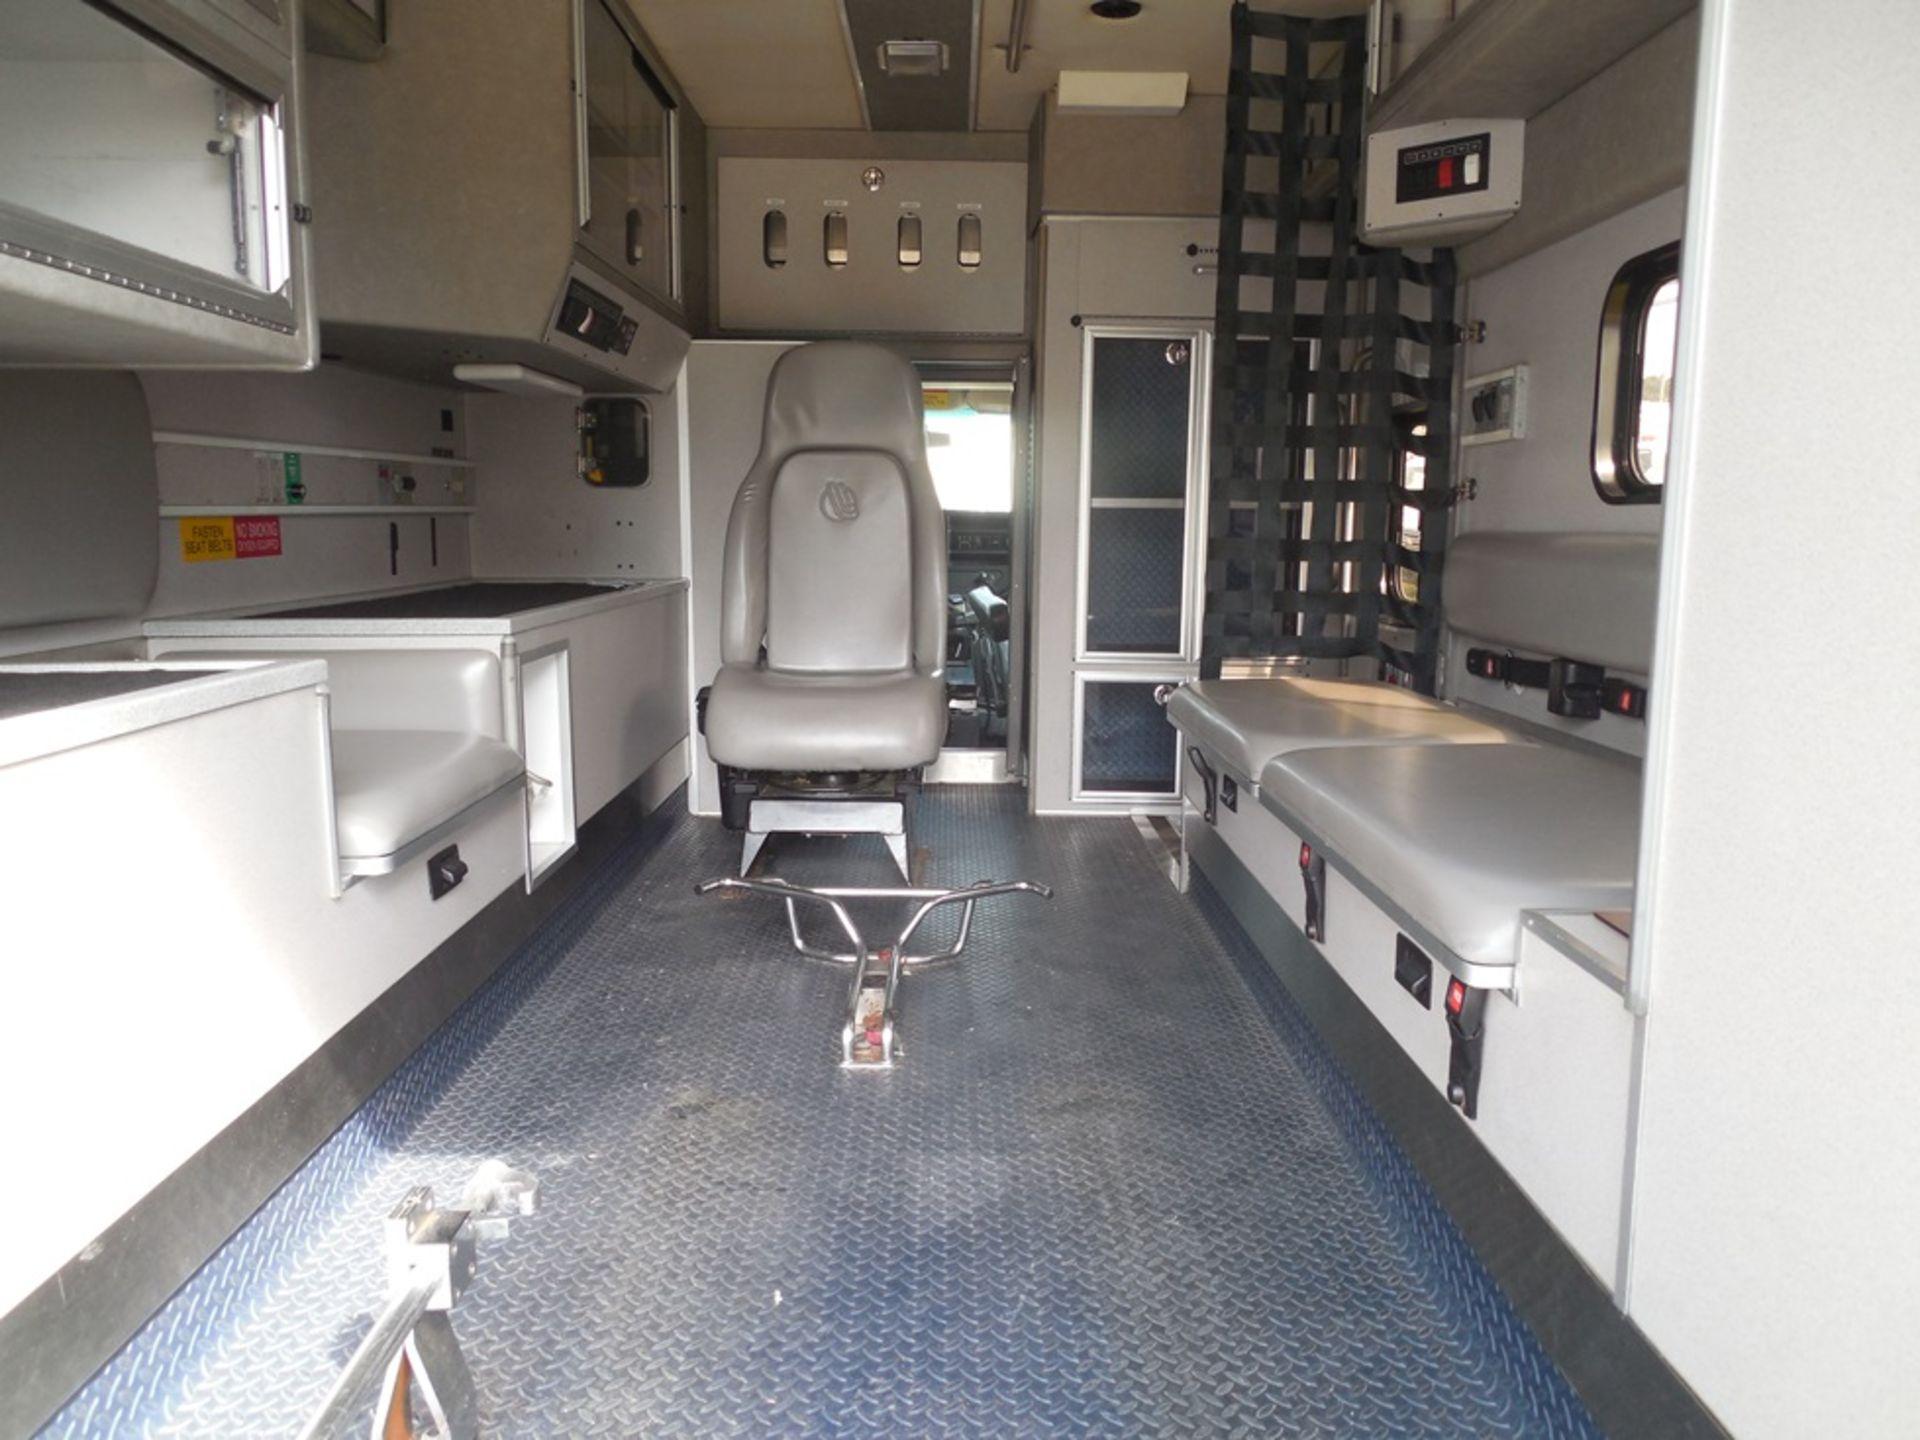 2010 Chev 4500 dsl box ambulance 258,589 miles, vin# 1GB9G5B6XA1132748 - Image 6 of 6